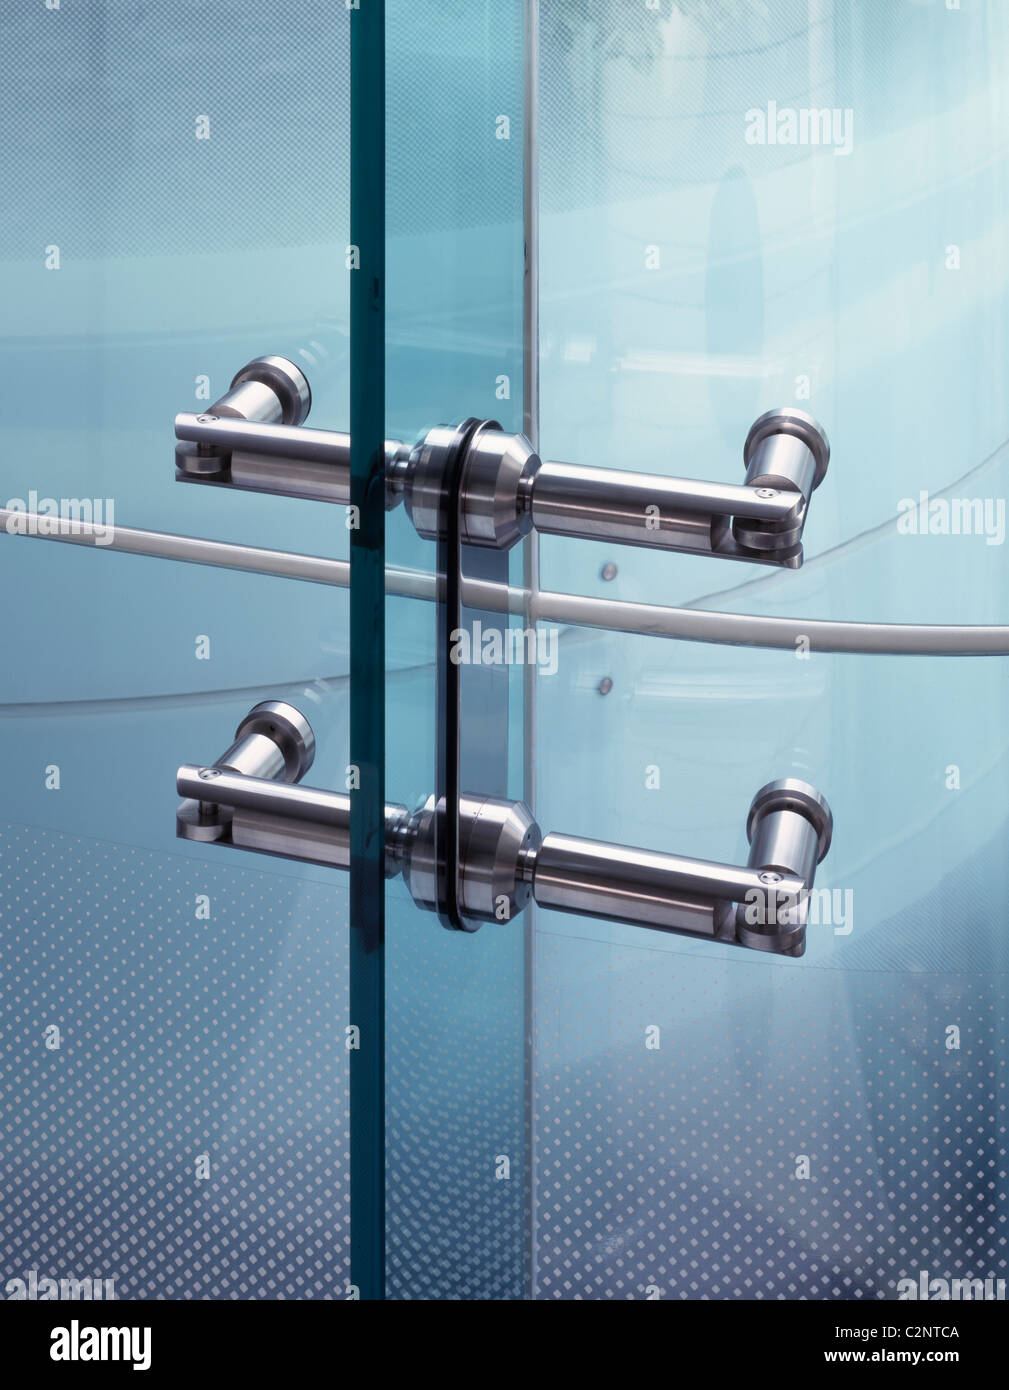 Criterion, London. Glazing detail. - Stock Image